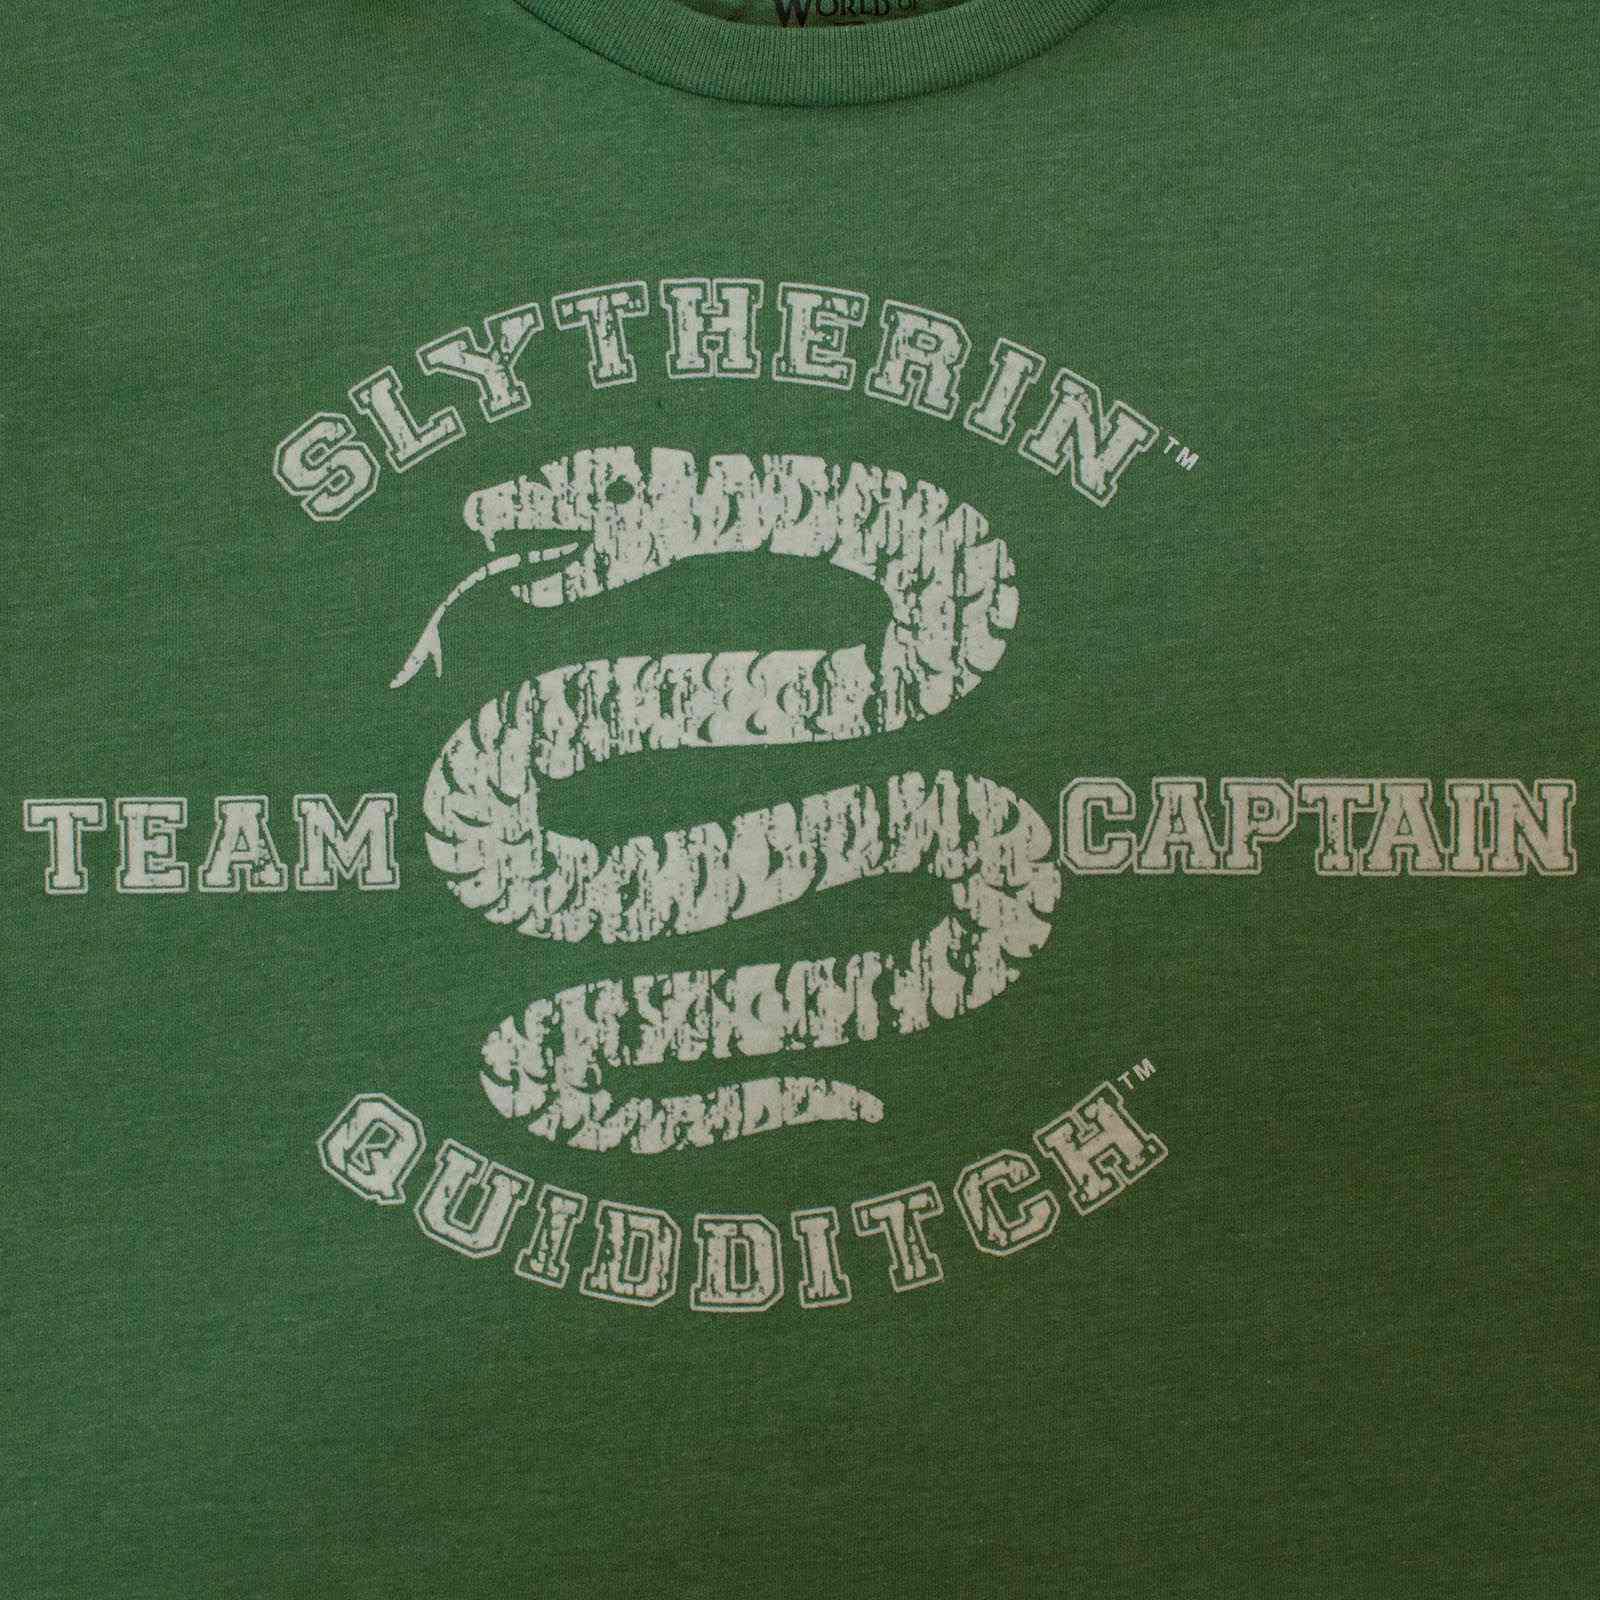 Футболка Harry Potter капитана Слизерина по квиддичу-увеличенное